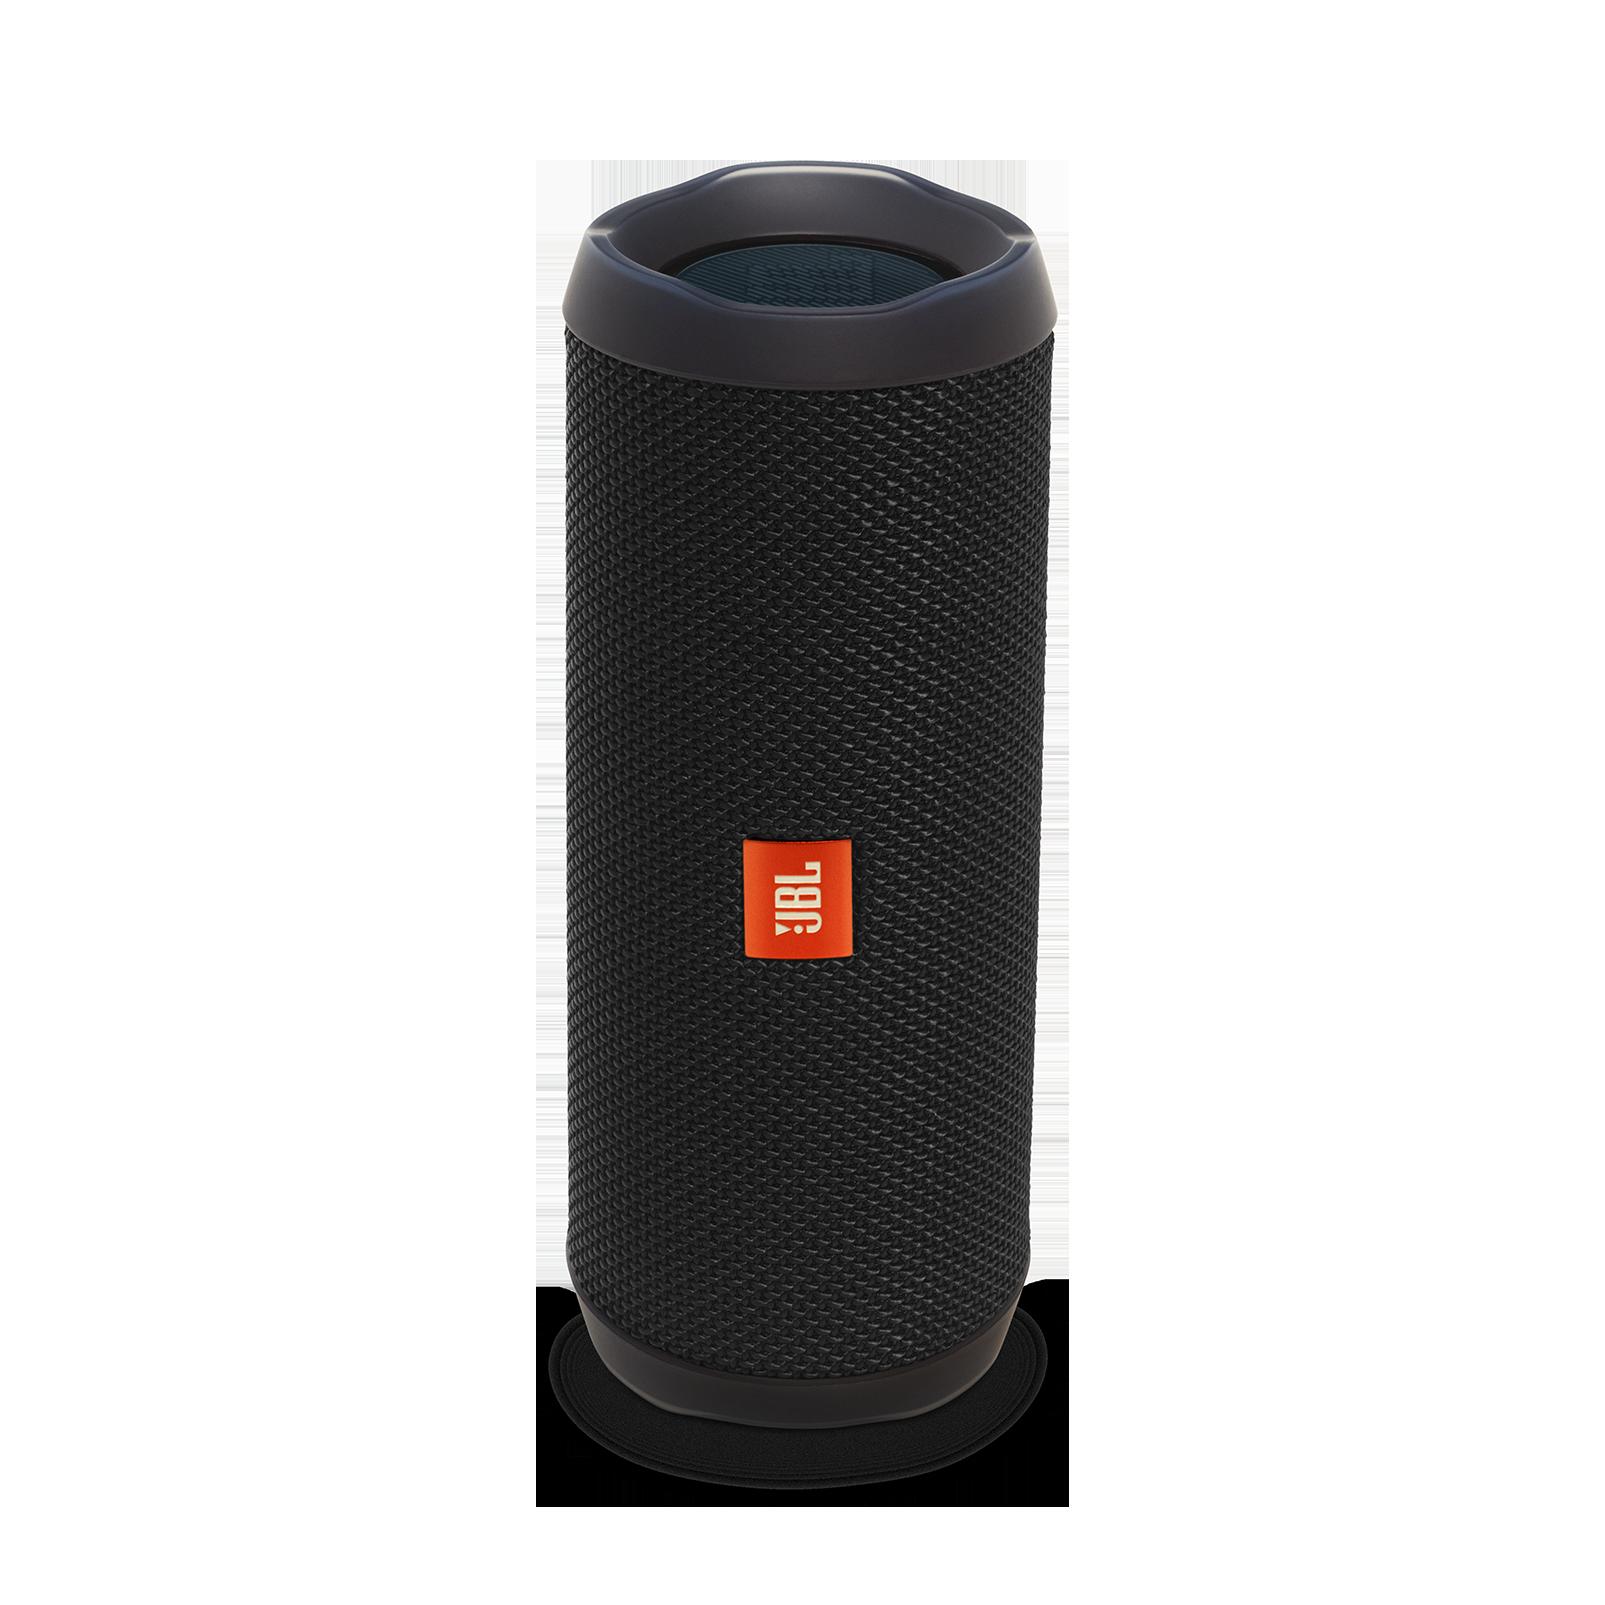 JBL Flip 4 - Black - A full-featured waterproof portable Bluetooth speaker with surprisingly powerful sound. - Hero